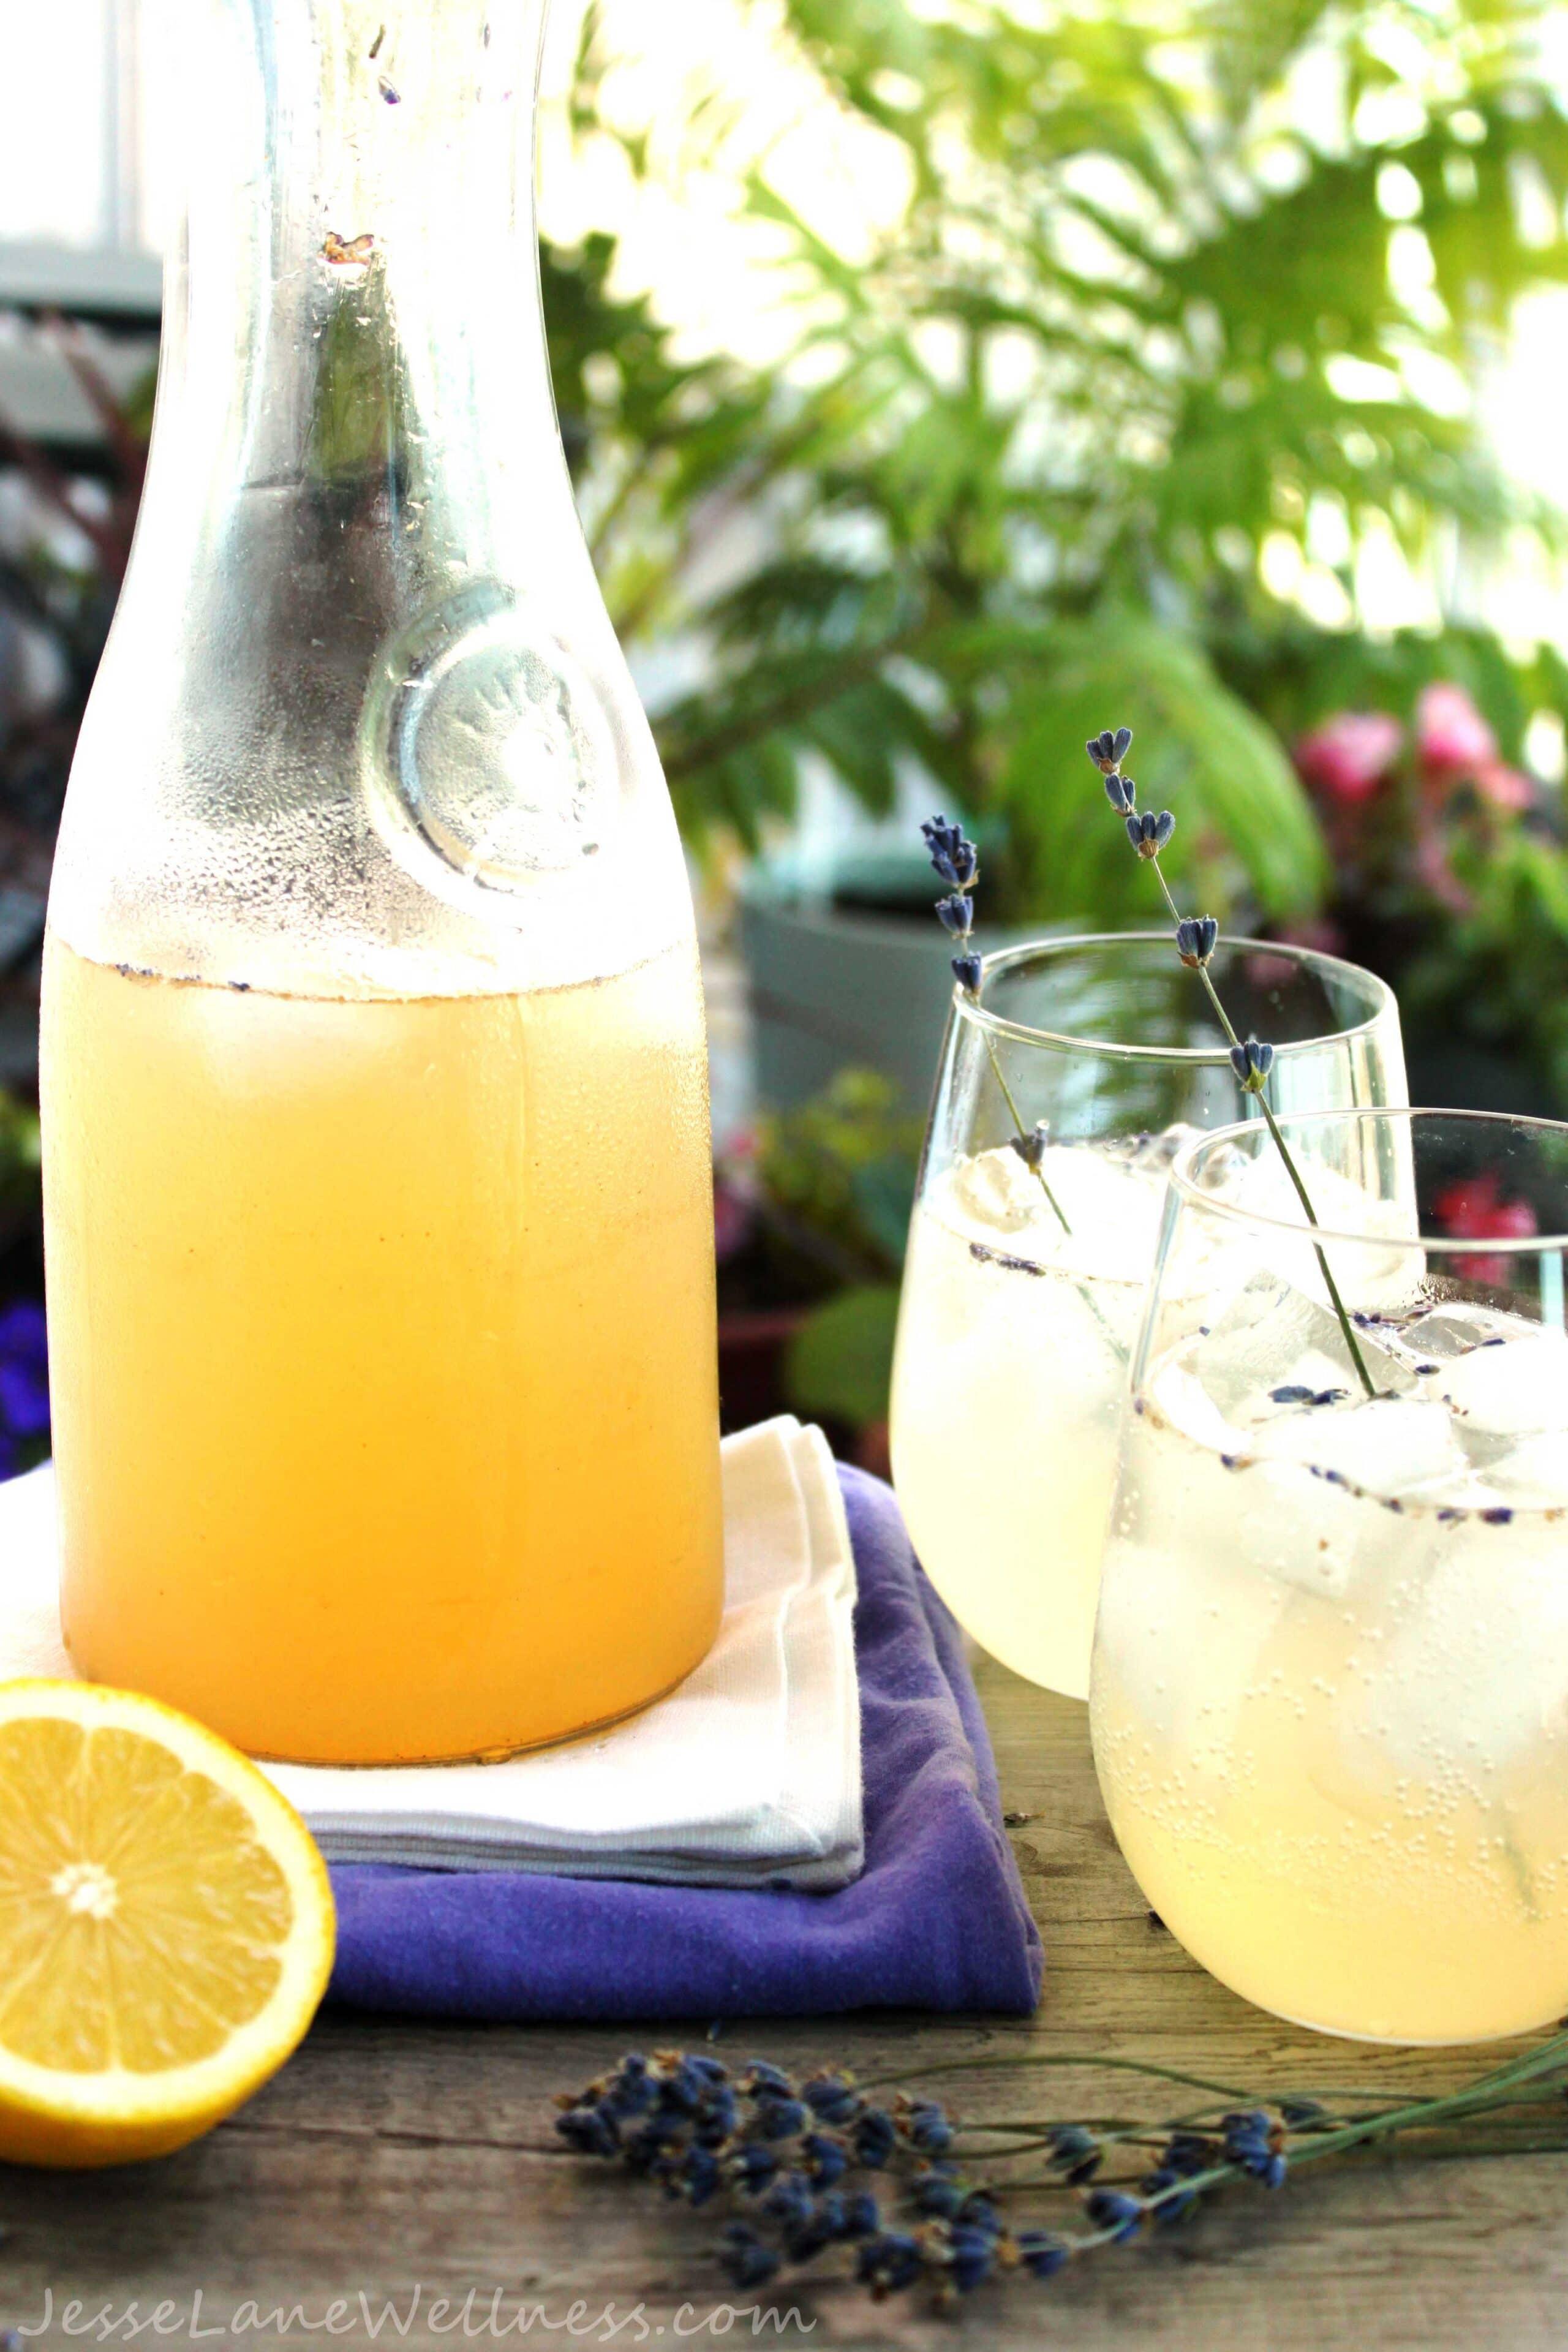 Fizzy Lavender Lemonade (sugar free) by Jesse Lane Wellness